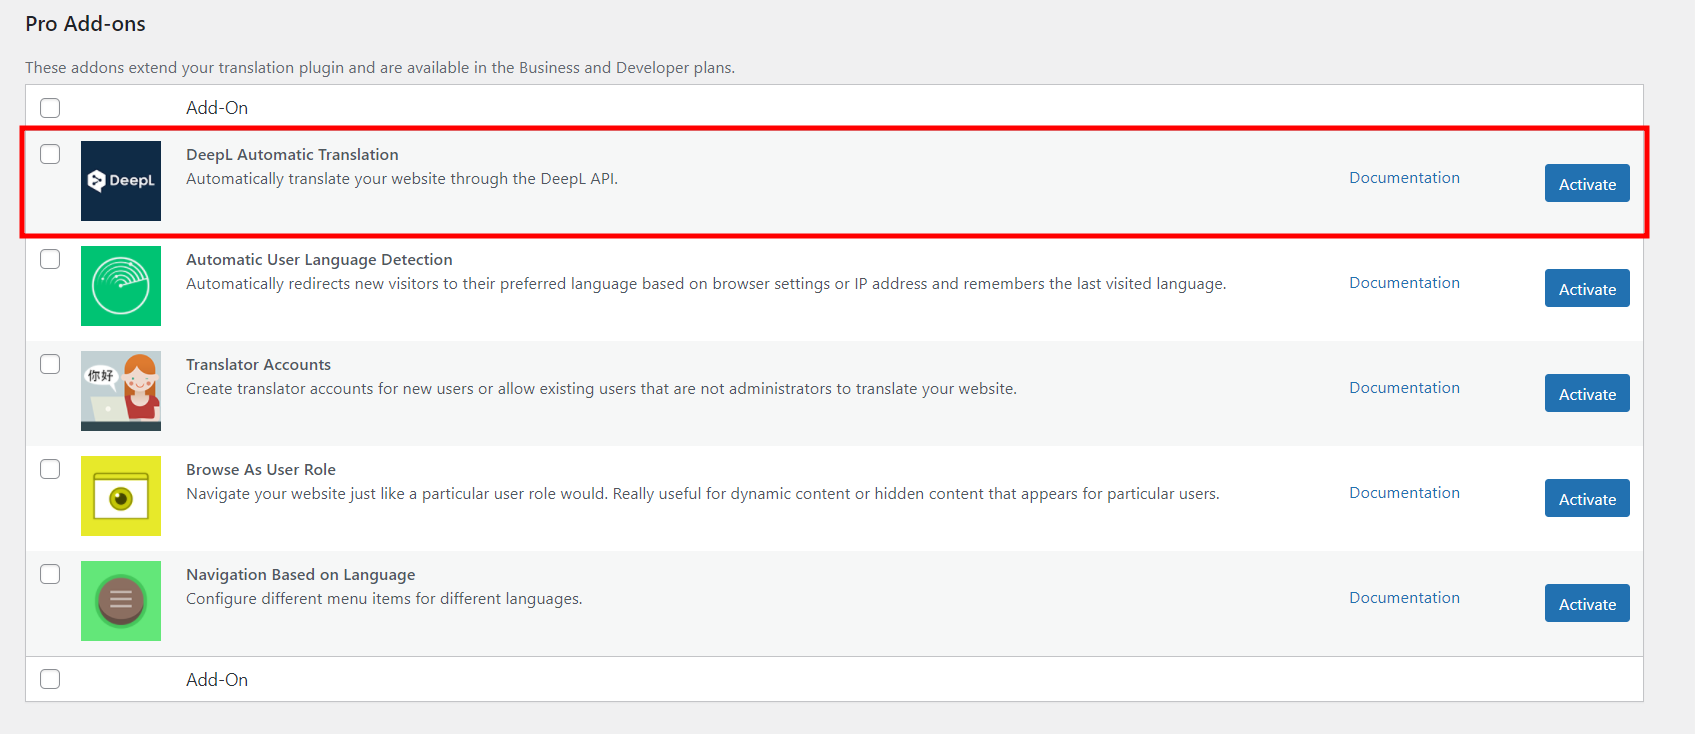 DeepL Automatic Translation Add-on